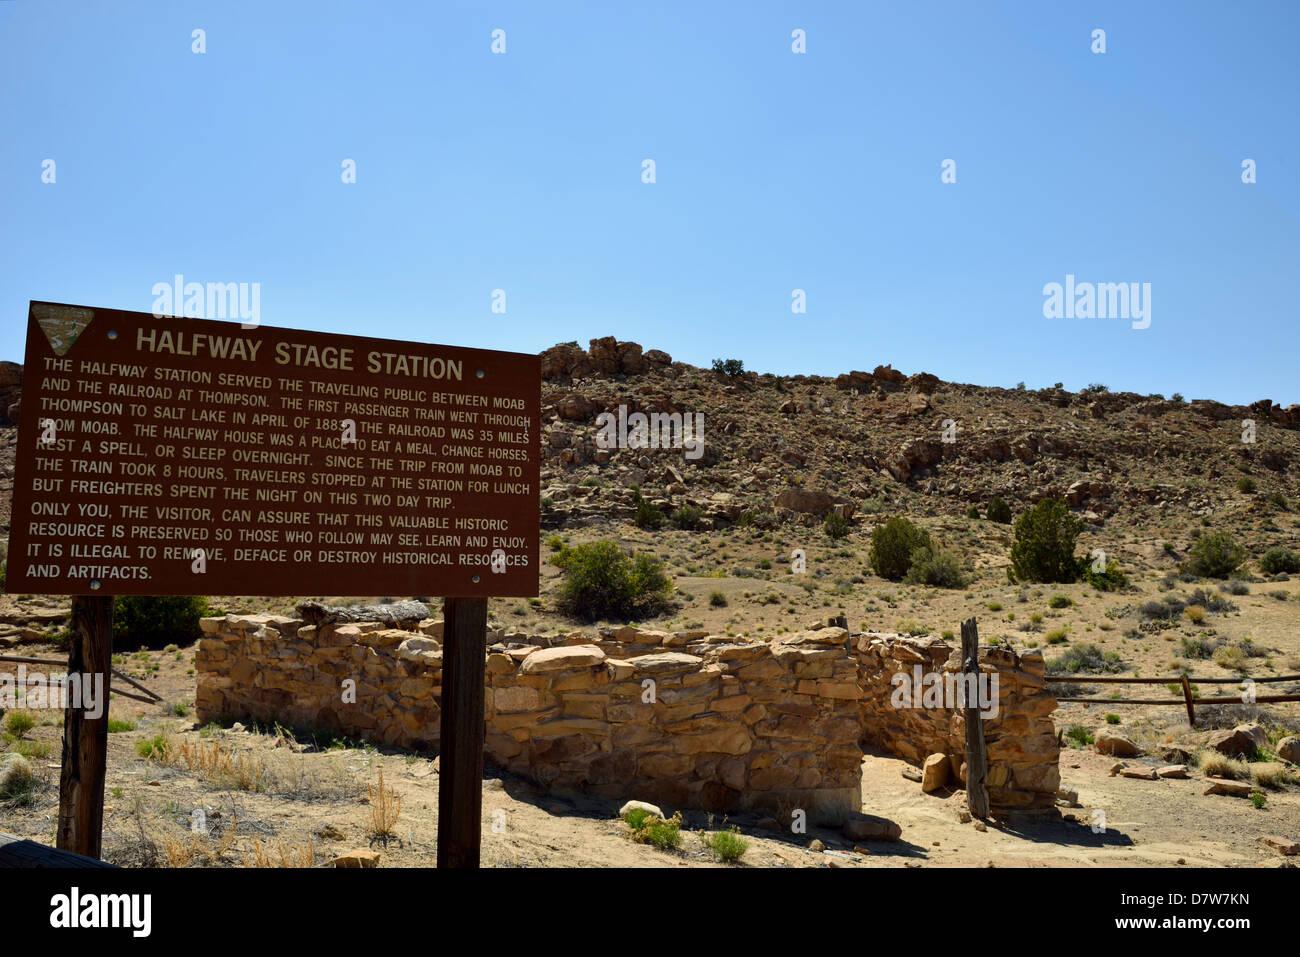 Remnant of Halfway Stage Wagon station. Moab, Utah, USA. - Stock Image